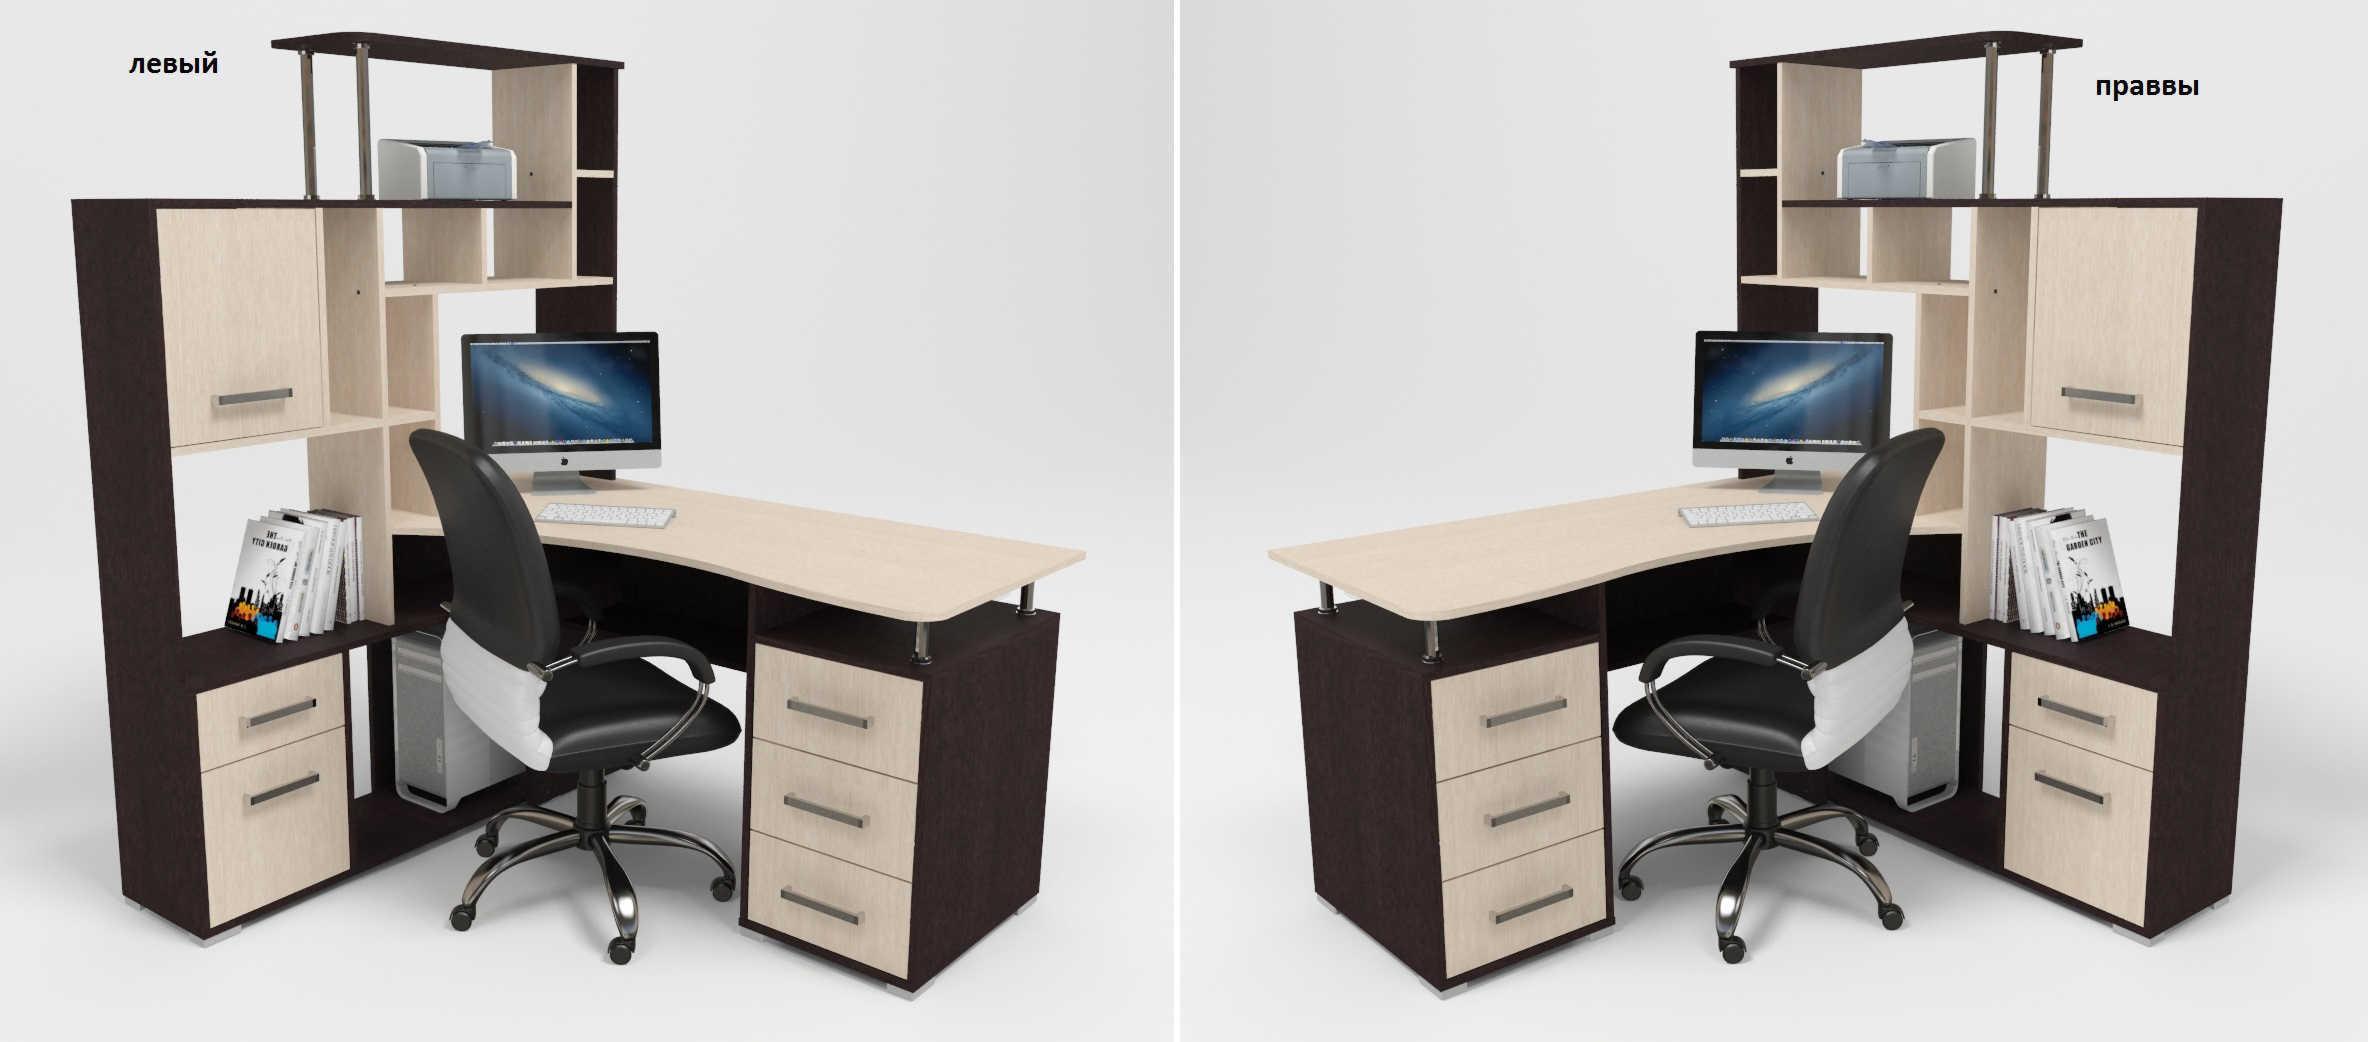 Компьютерный-стол-Джаз-КС15